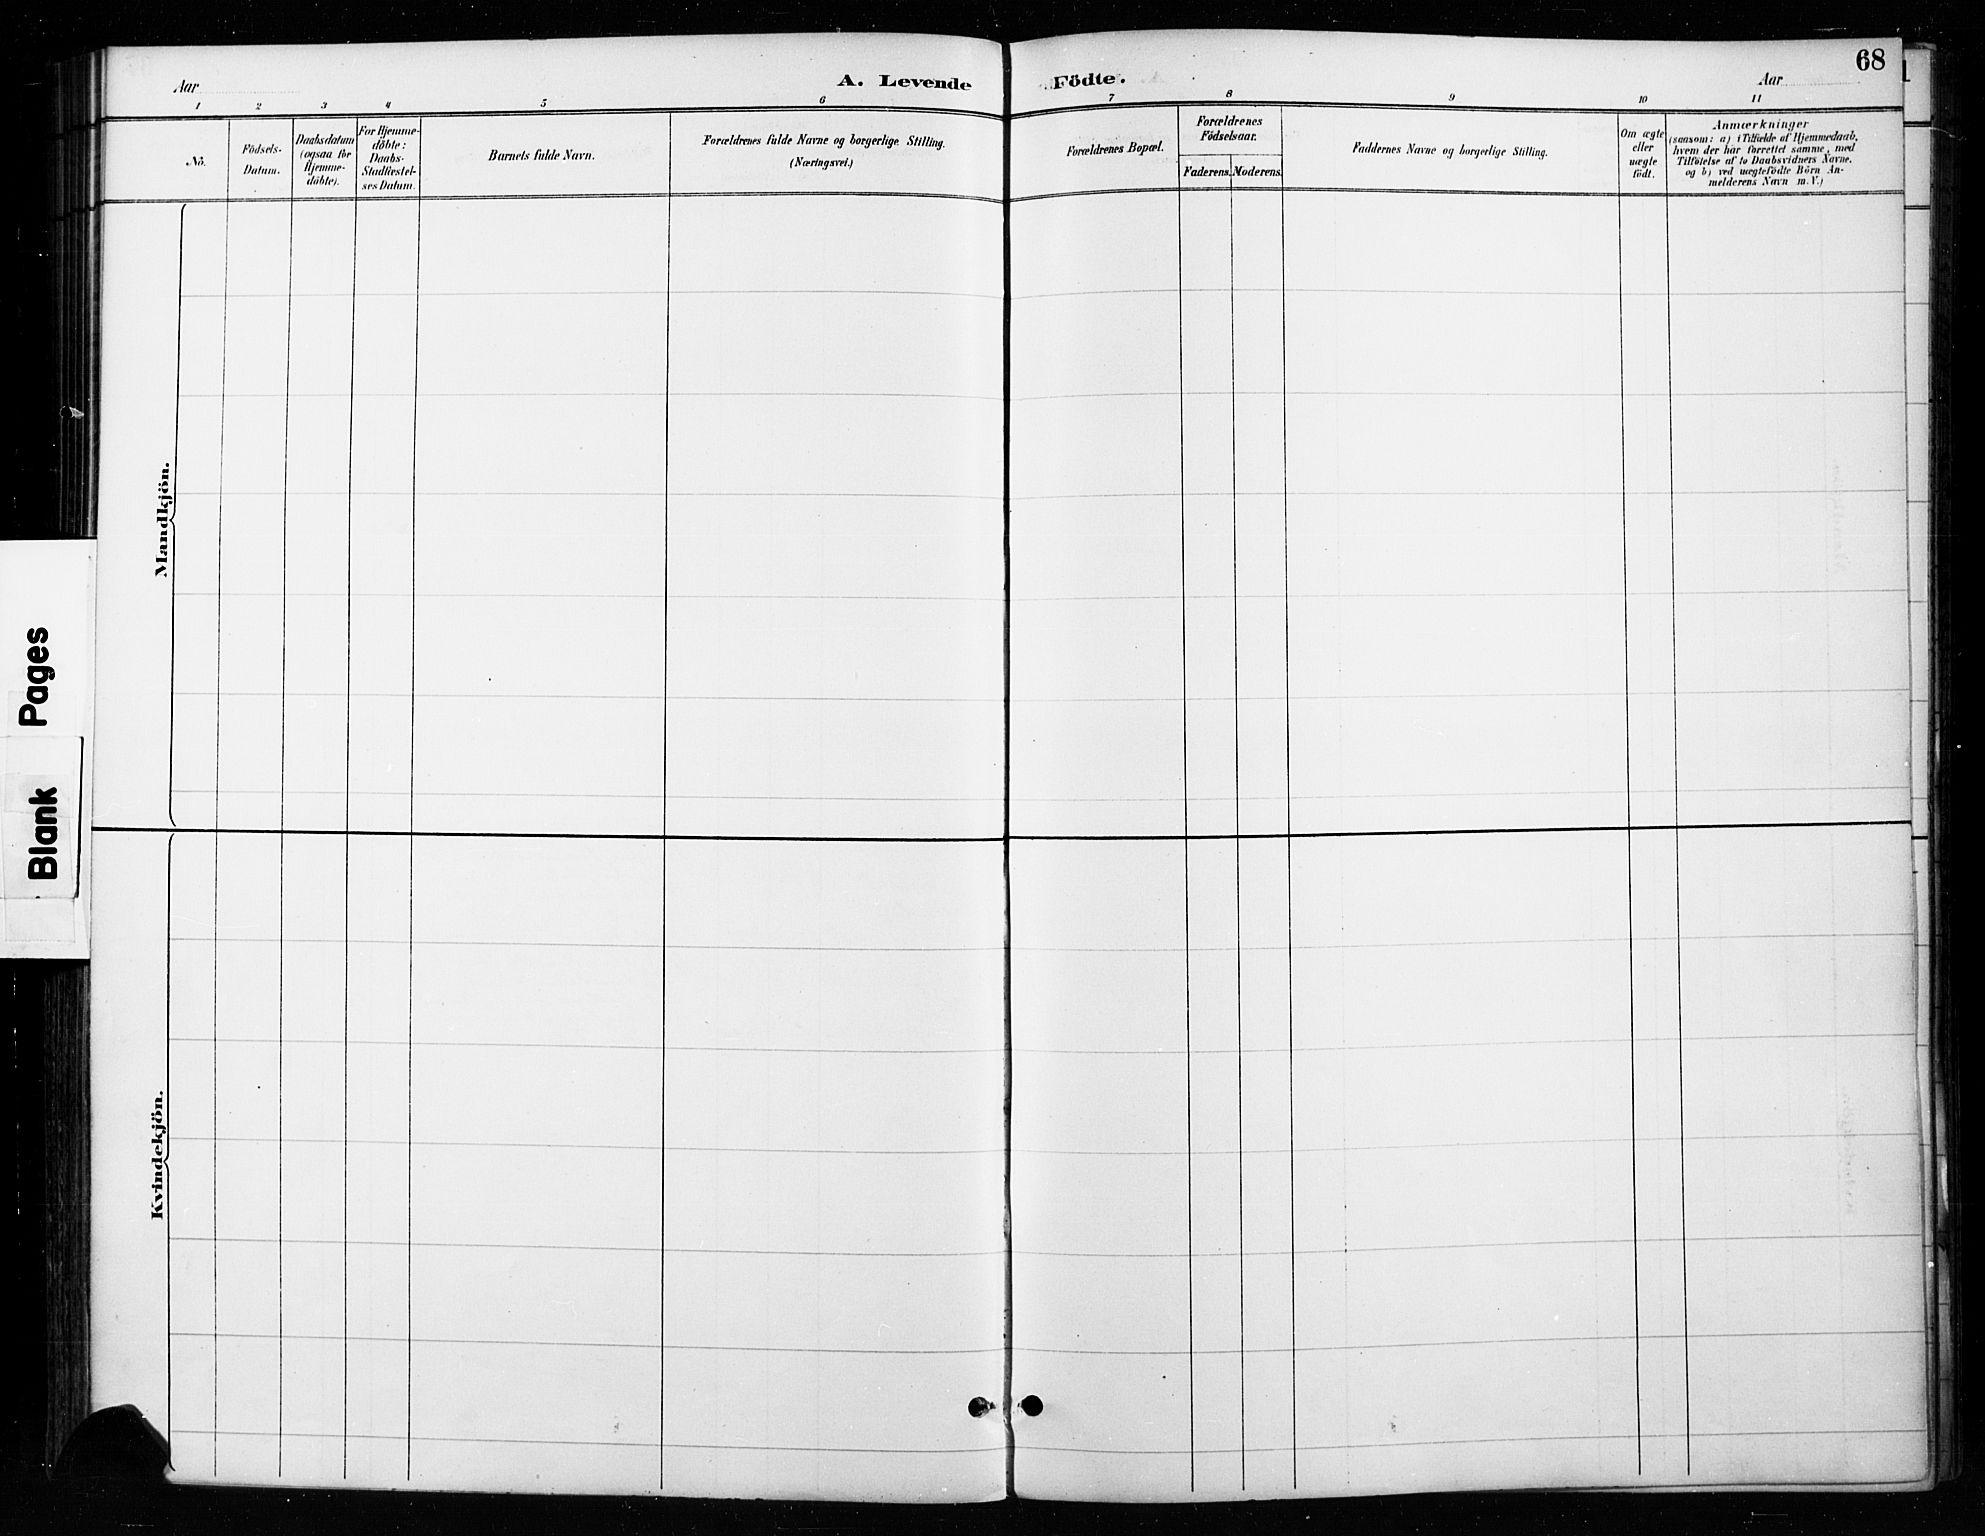 SAH, Gran prestekontor, Ministerialbok nr. 18, 1889-1899, s. 68